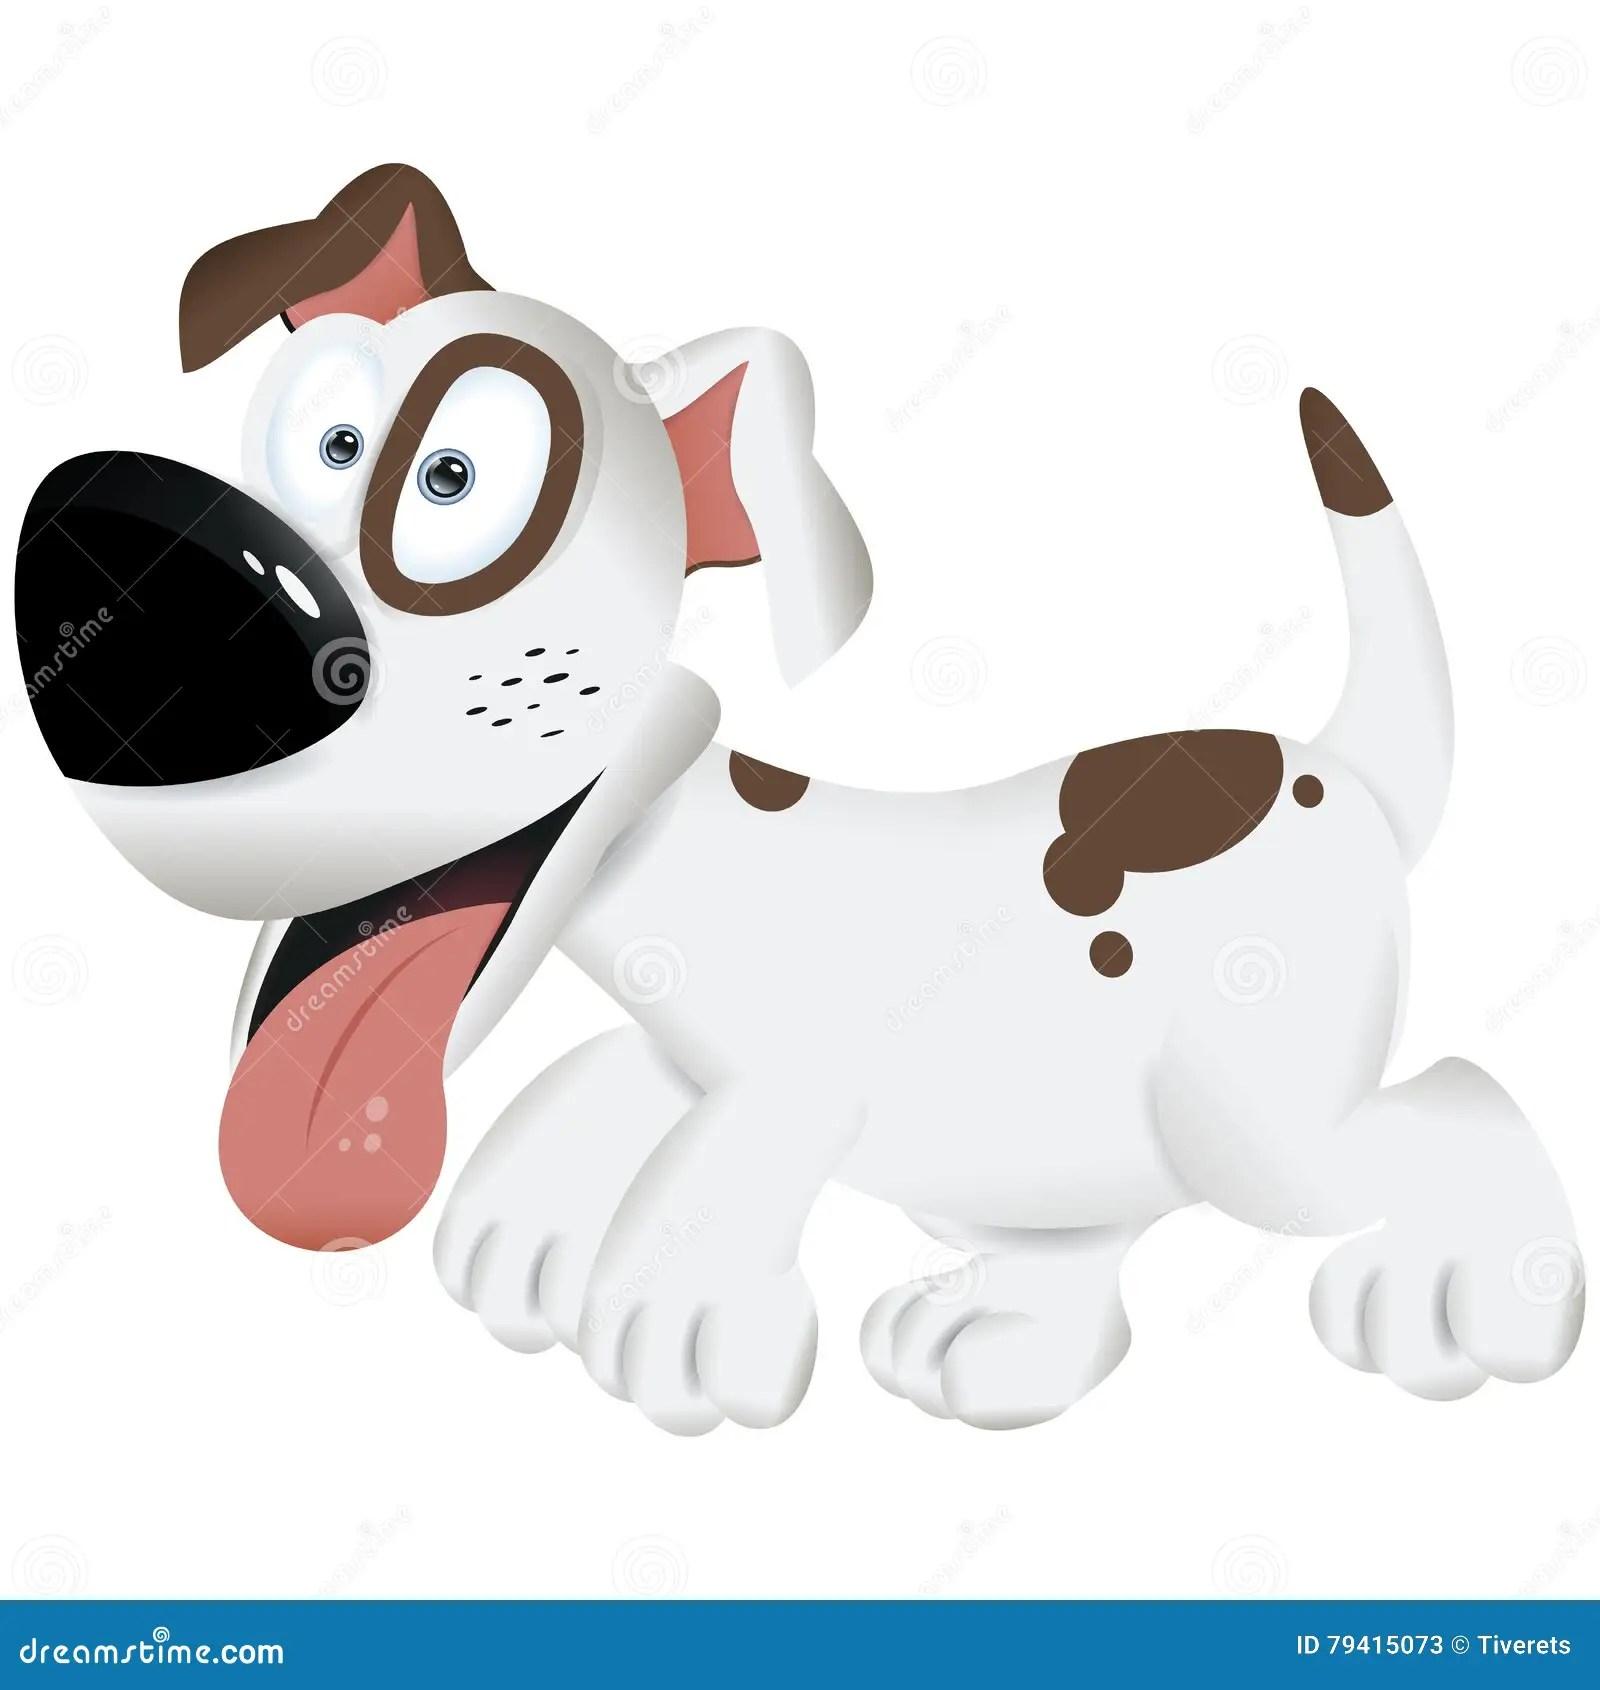 Cute Cartoon Dog White And Brown Dog Vector Illustration Stock Illustration Illustration Of Drawing Mammal 79415073